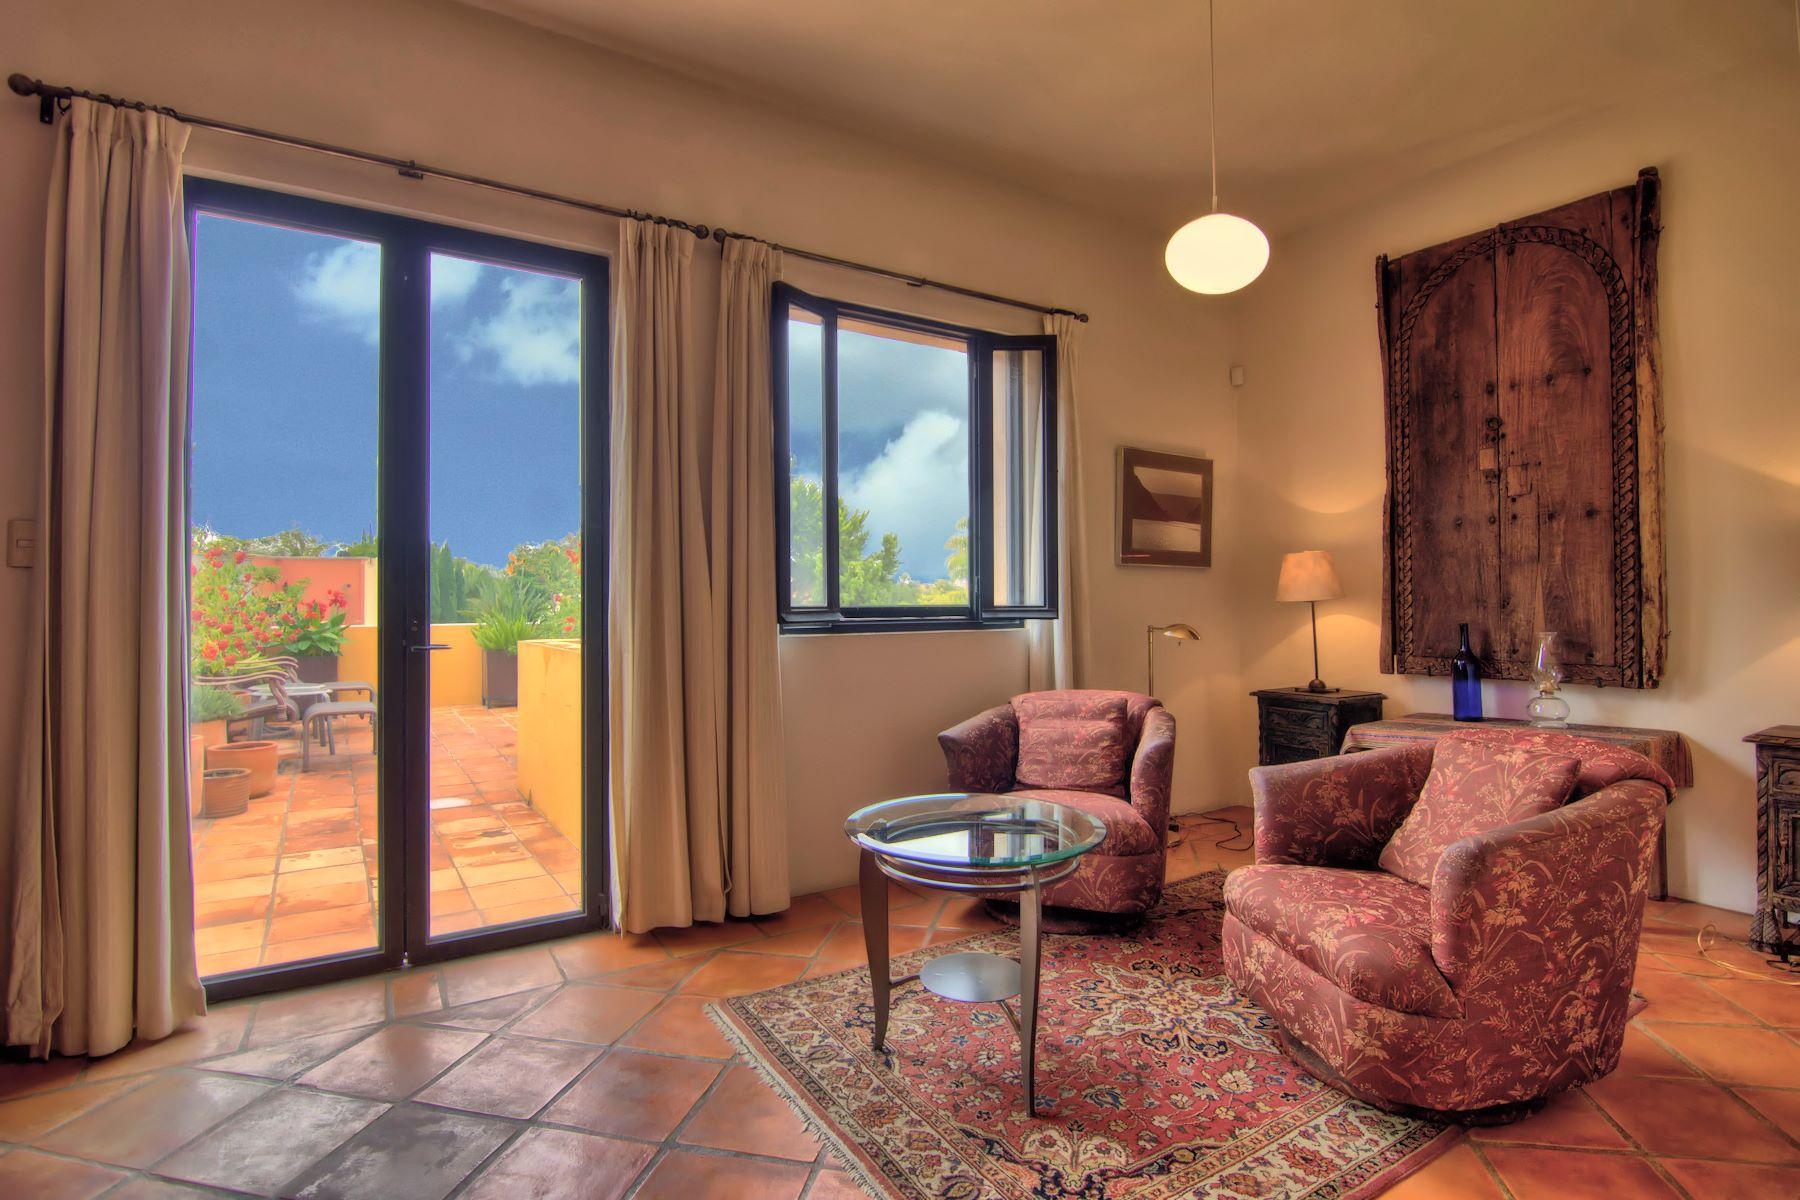 Additional photo for property listing at Casa Susan Guadiana, San Miguel De Allende, Guanajuato México